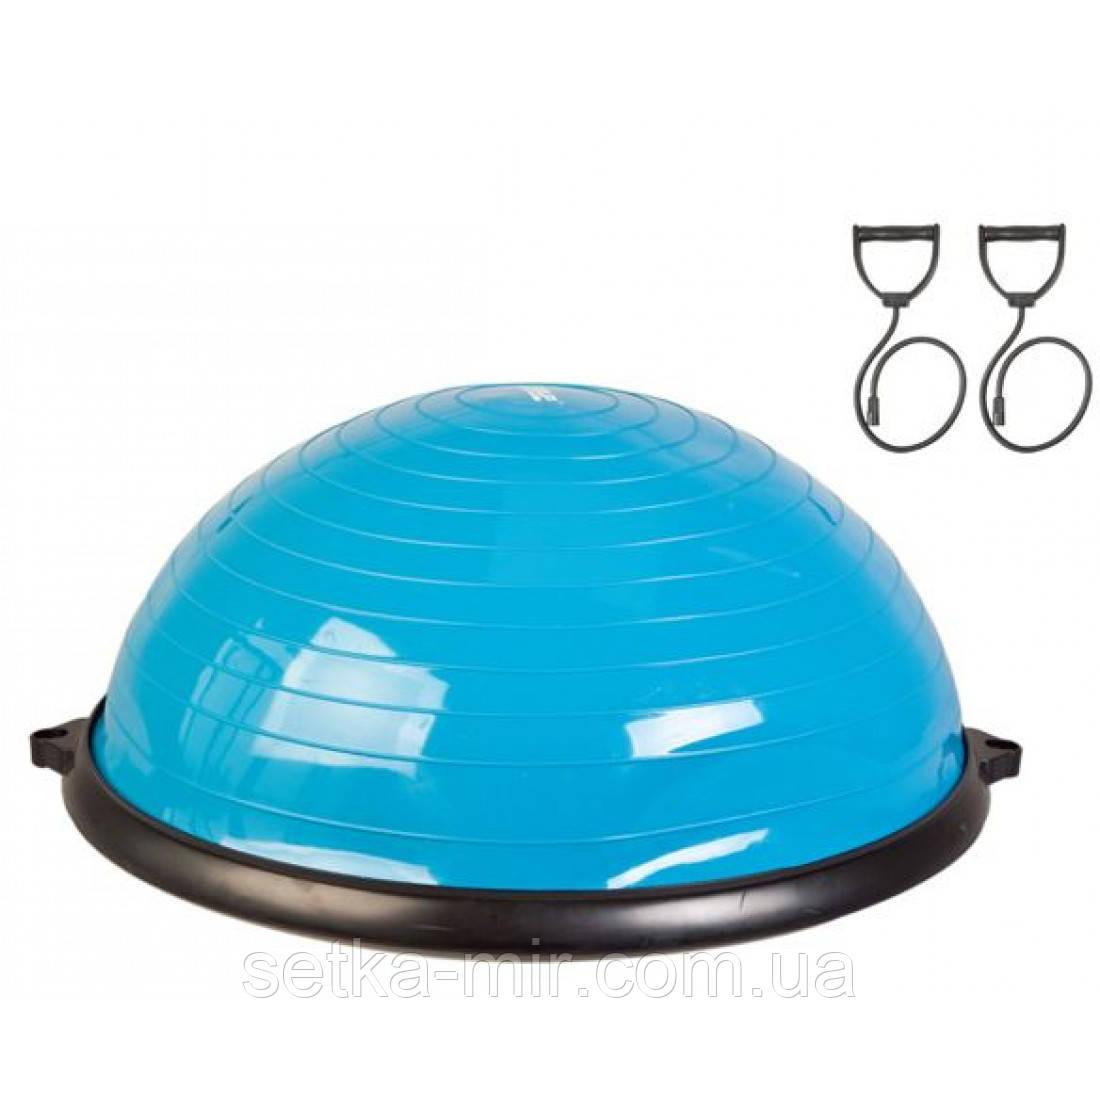 Балансировочная платформа LiveUp Bosu Ball